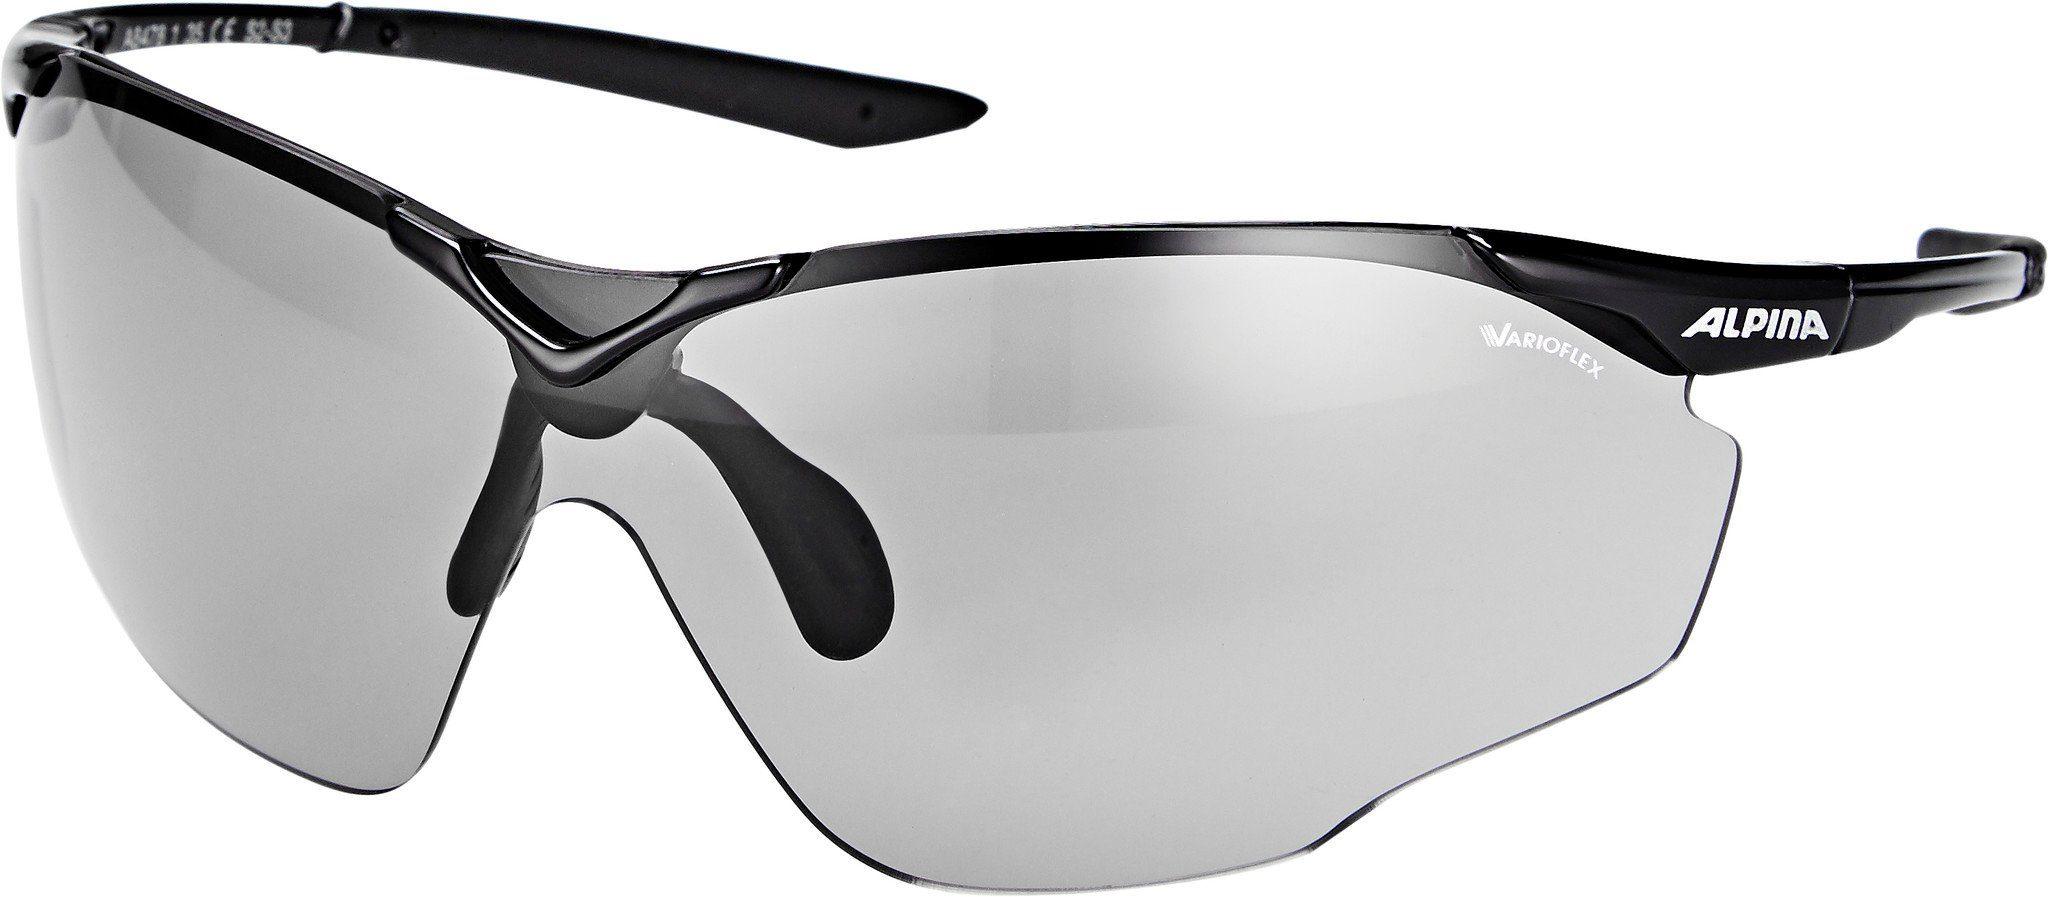 Alpina Radsportbrille »Alpina Splinter Shield VL«